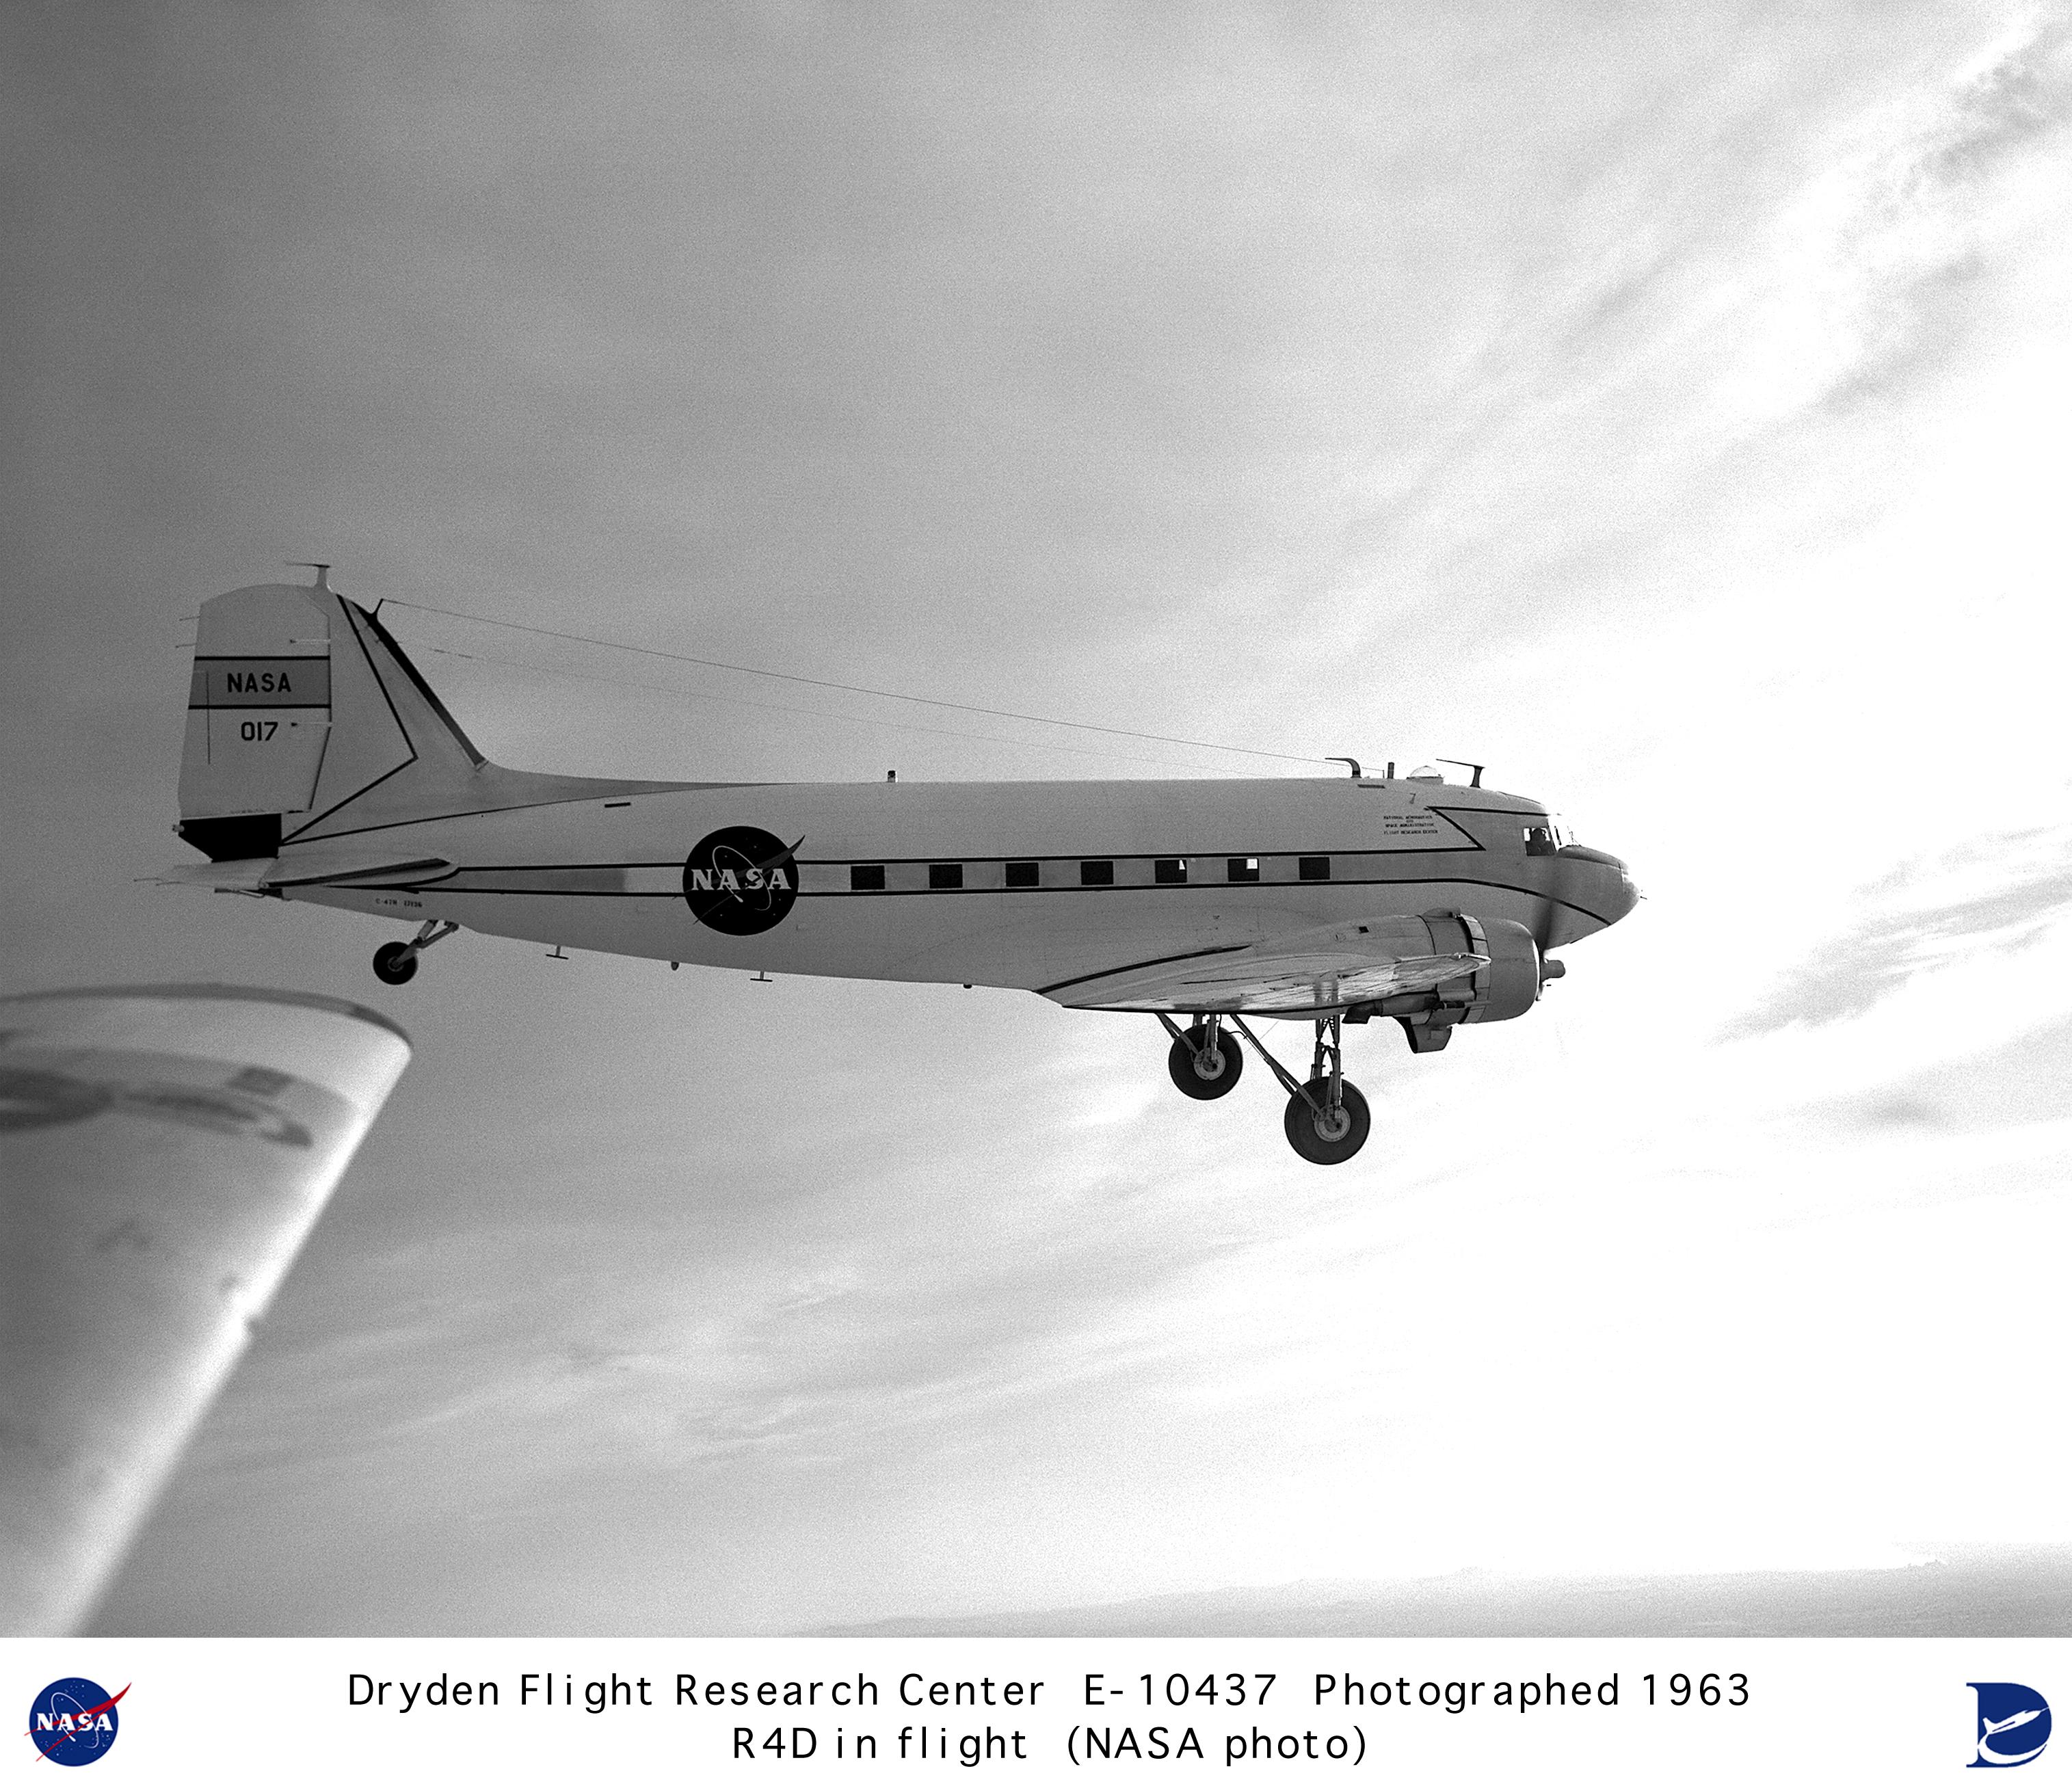 E-10437.jpg